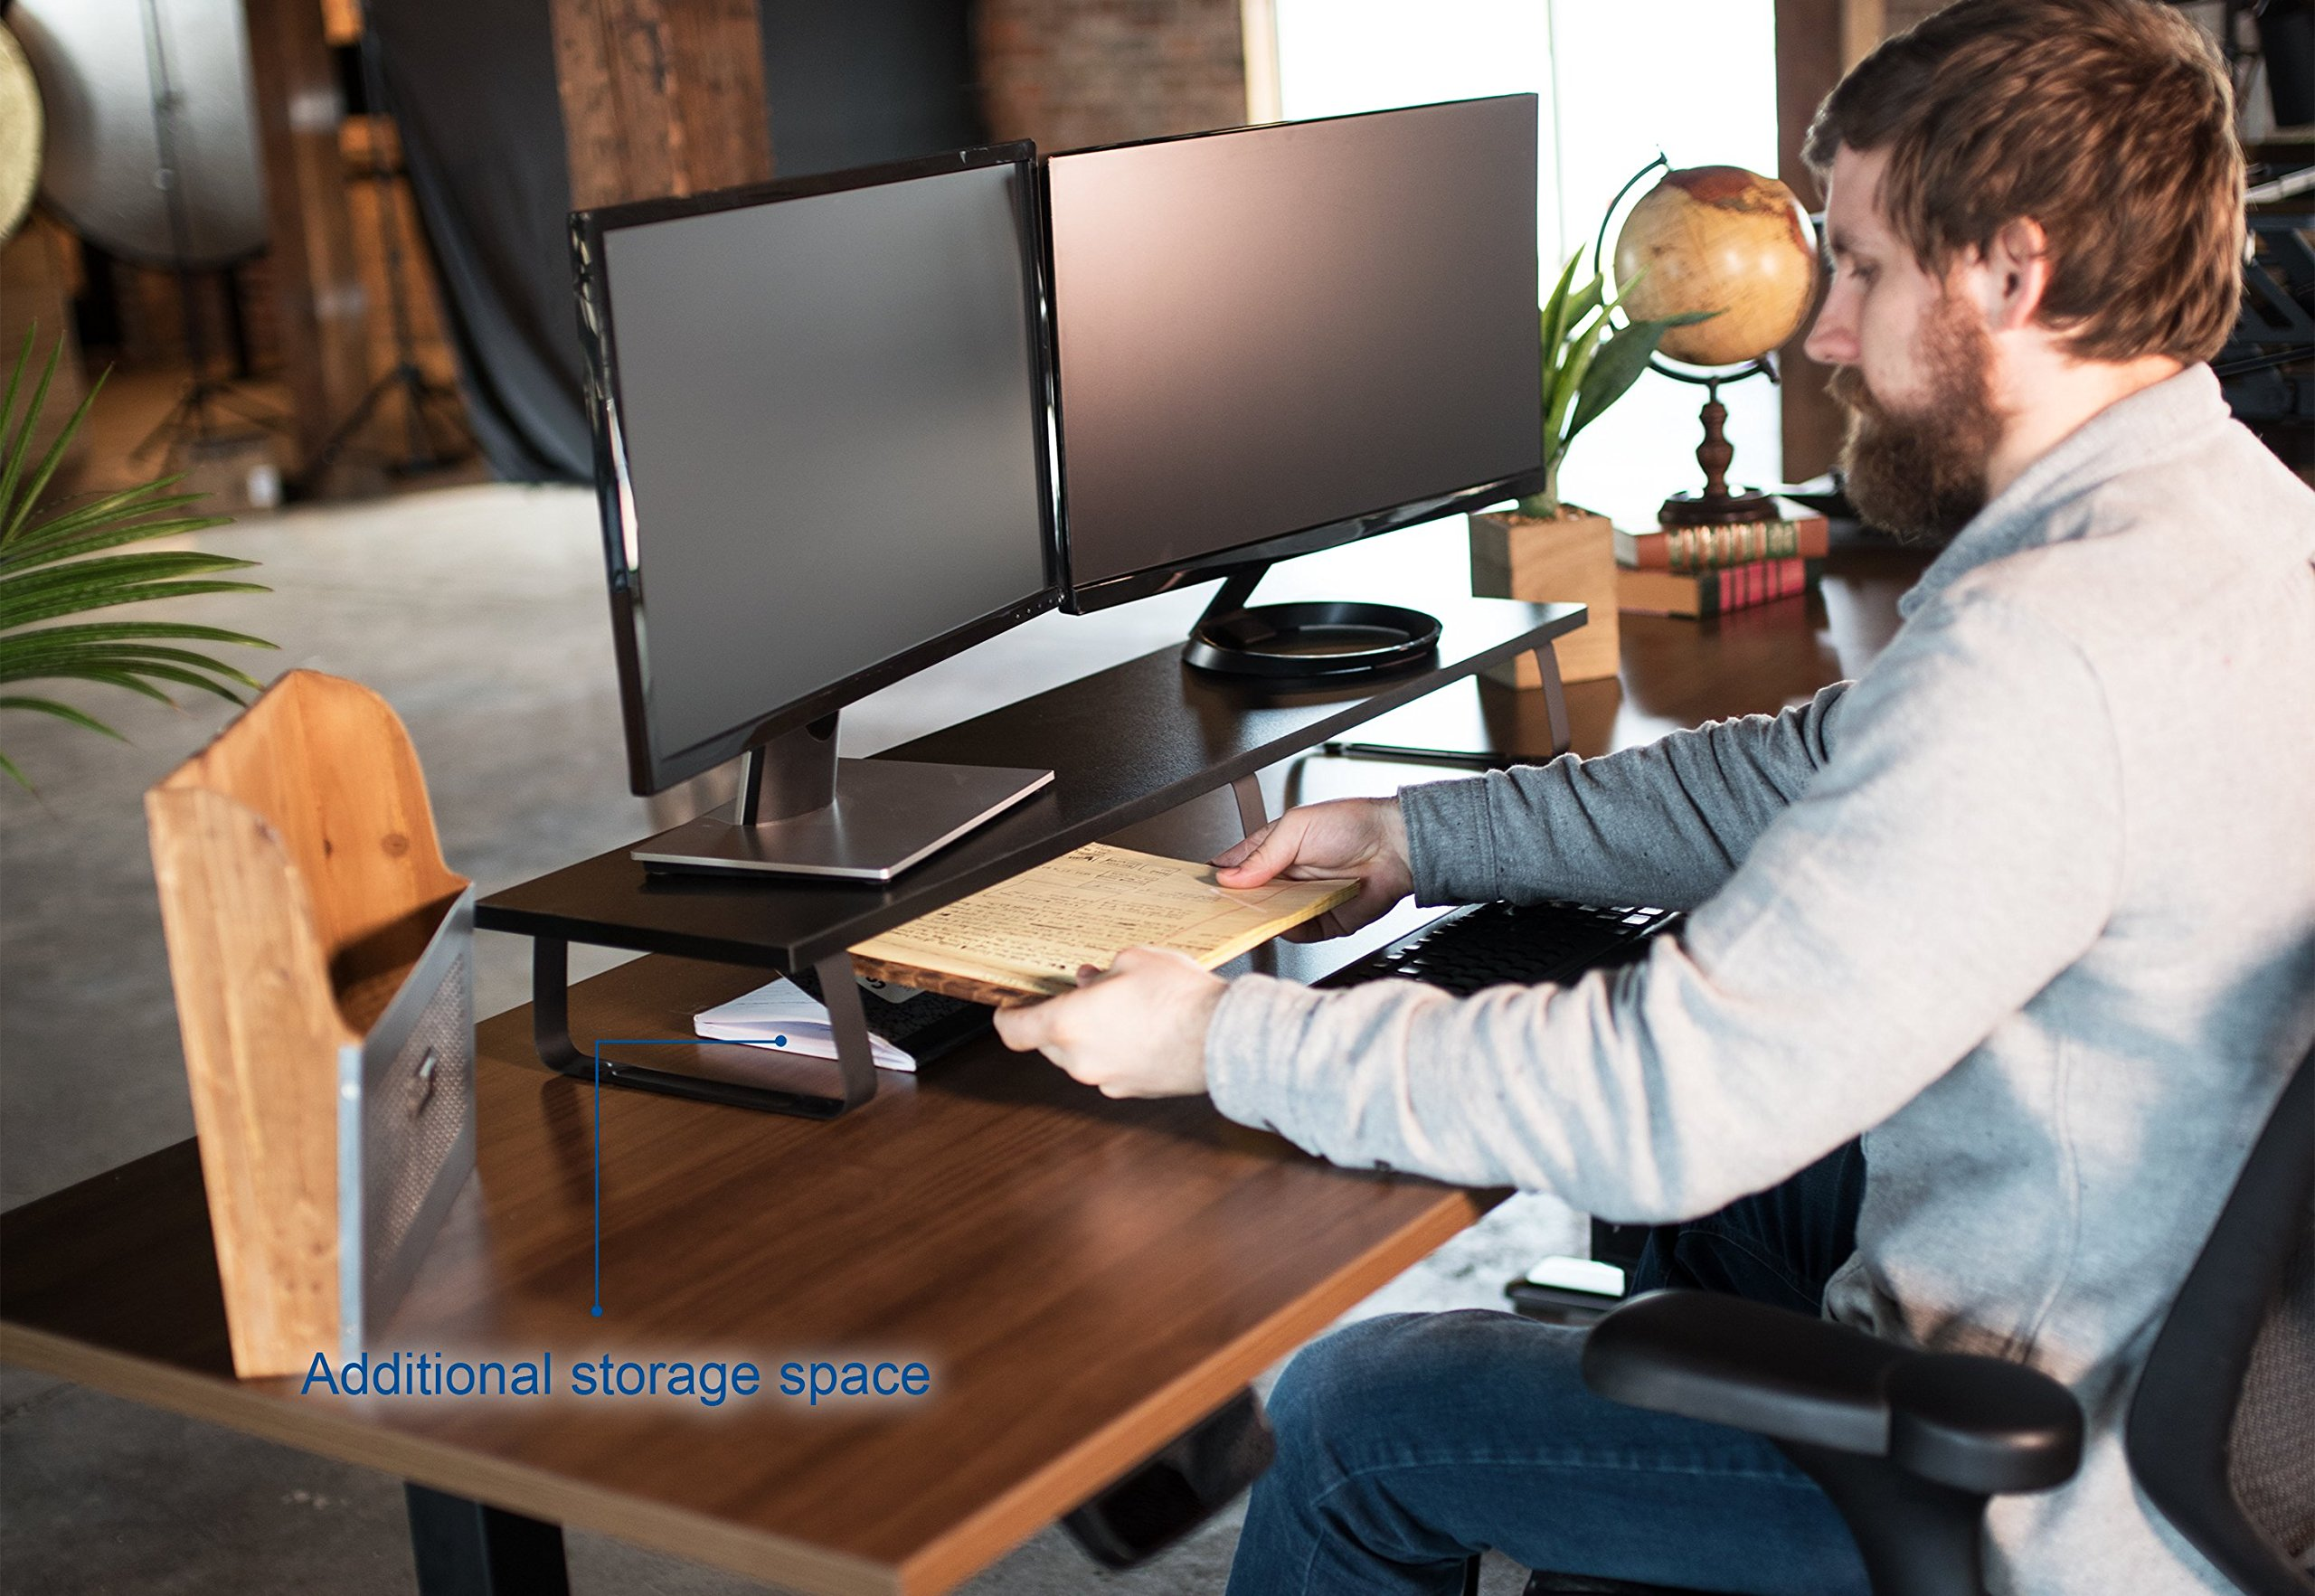 VIVO Black Wood 39'' Wide Extra Long Desktop Stand Ergonomic TV, Dual Monitor Riser and Desk Tabletop Organizer (STAND-V000DL) by VIVO (Image #6)